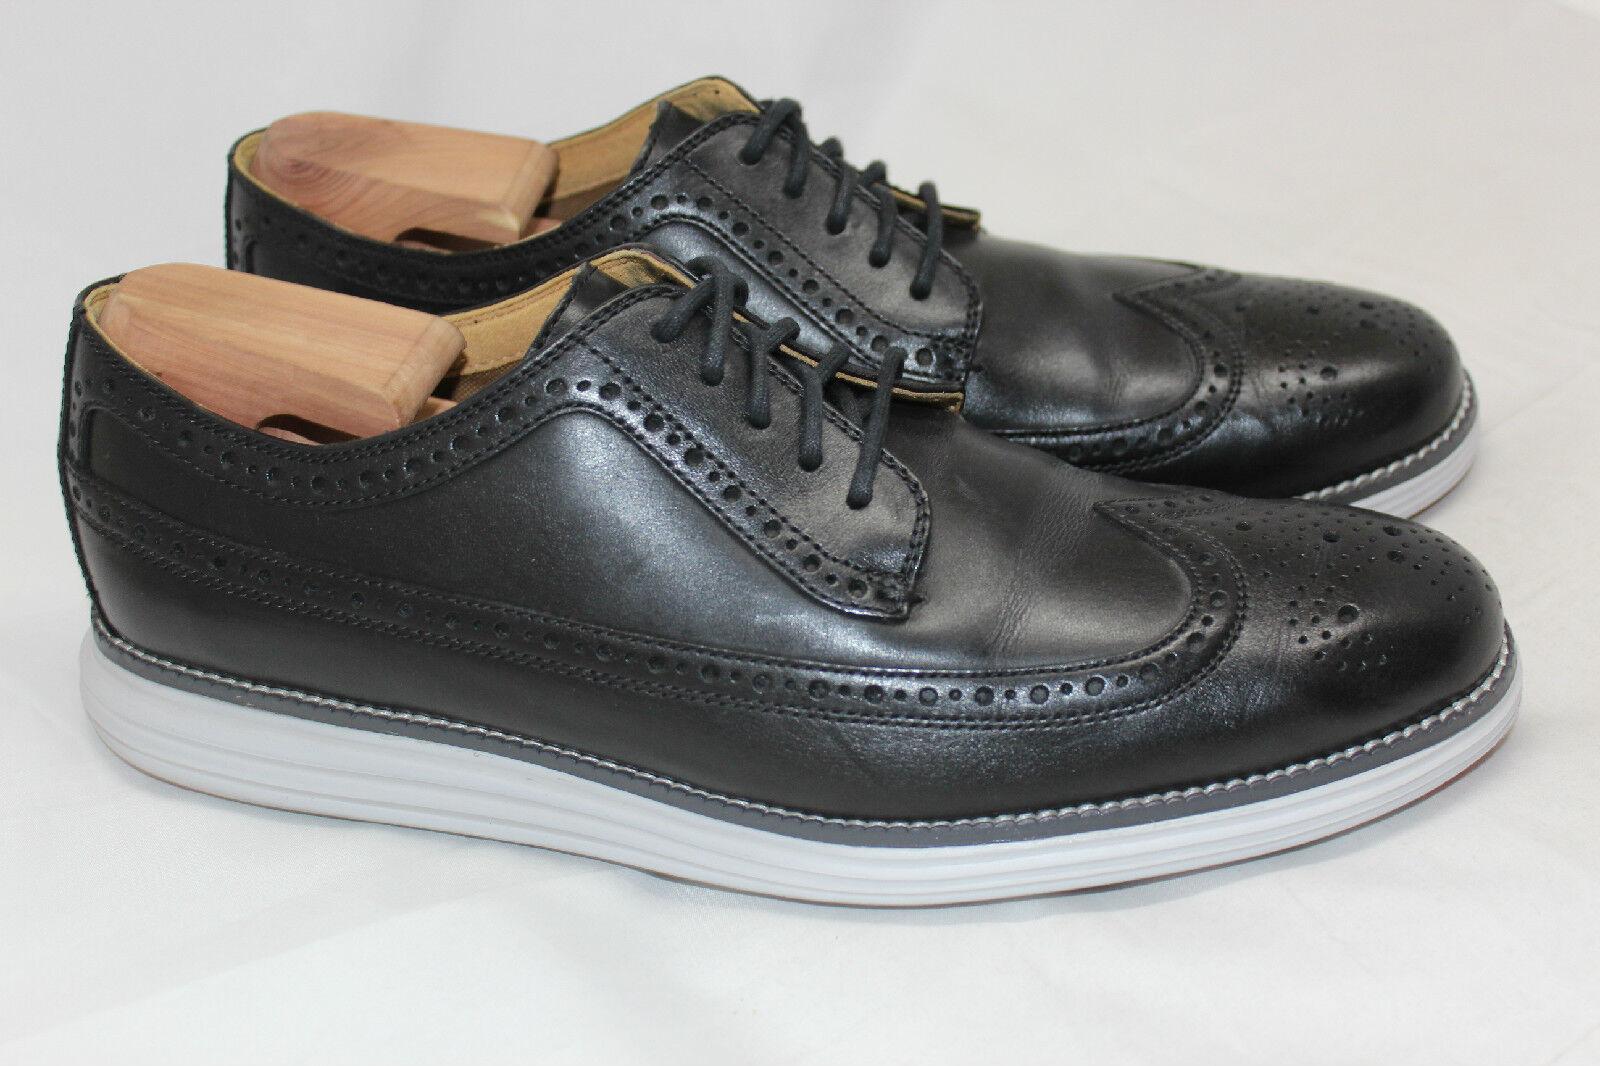 Para Hombre Cole Haan 'Original Grand' Oxford punta del ala Zapato-Negro 10.5M - C21198 (R31)